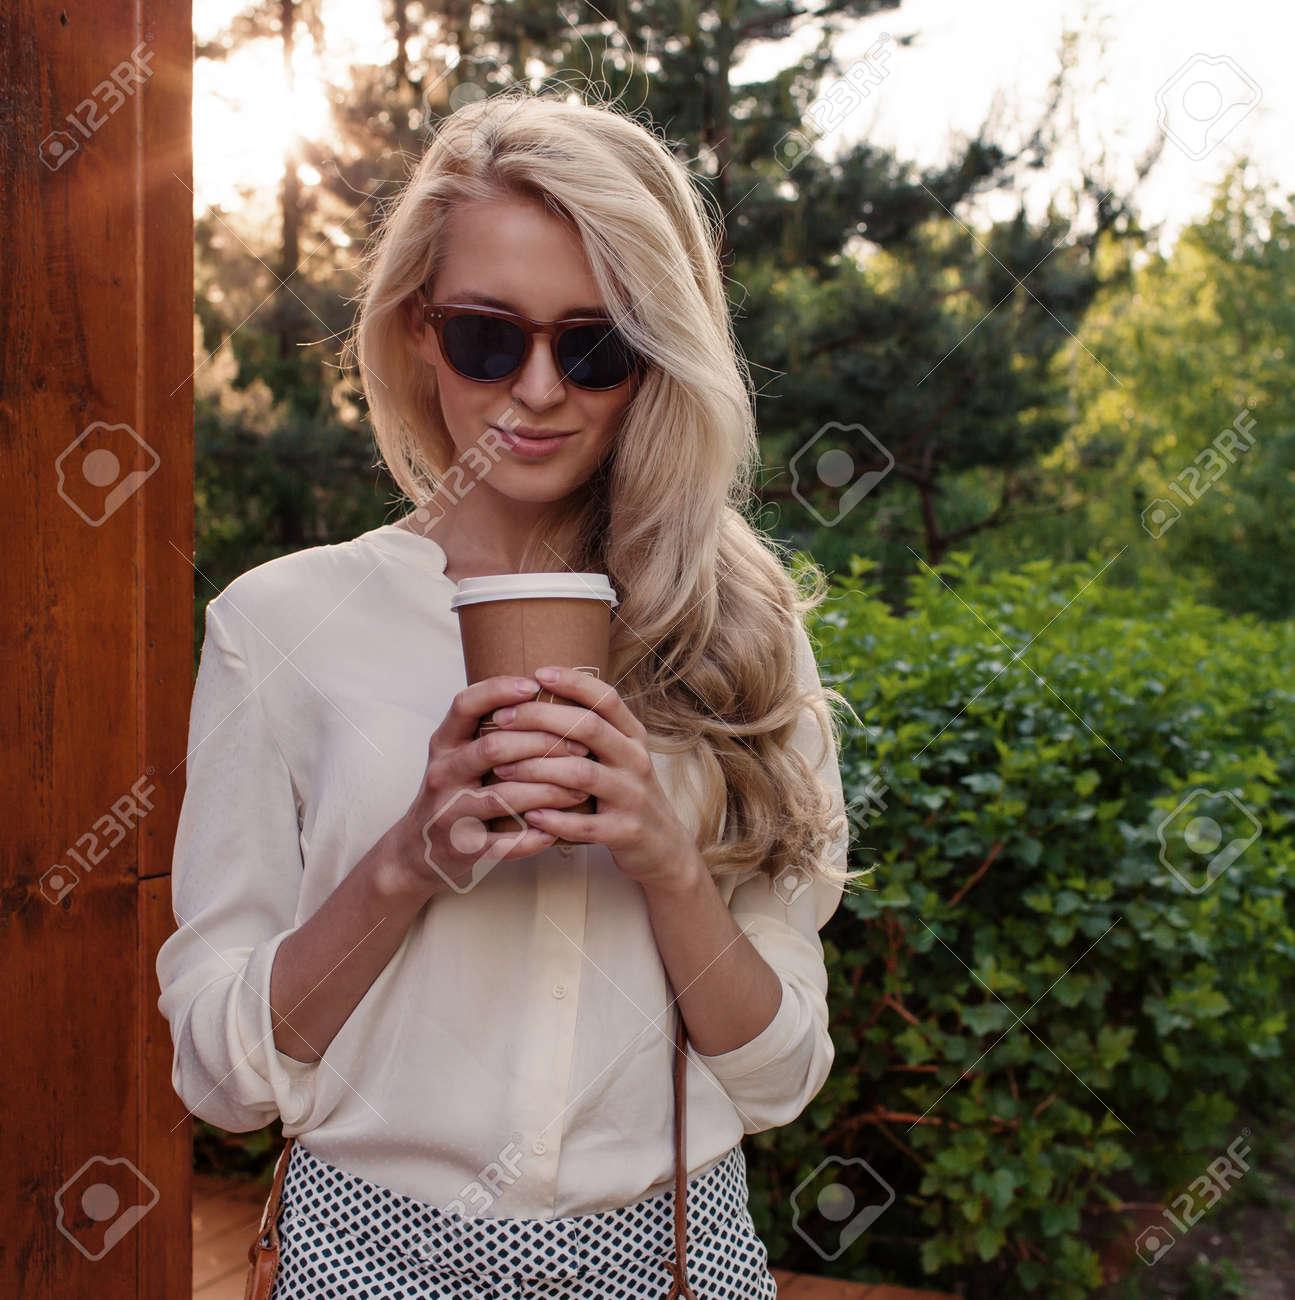 sexy-blonde-having-fun-mature-woman-nude